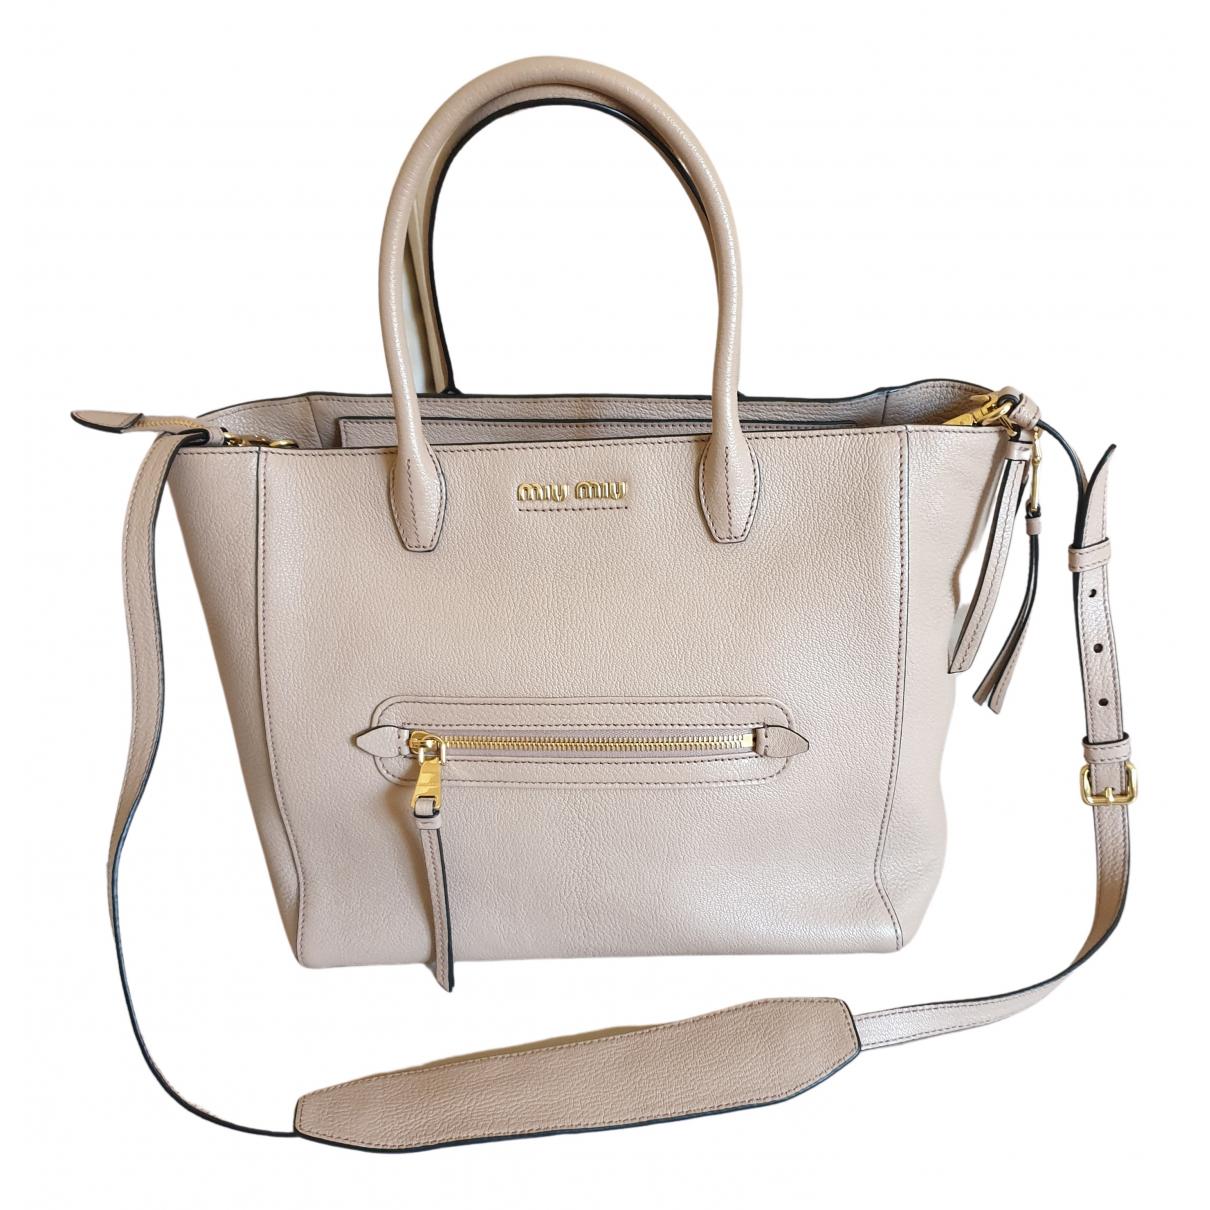 Miu Miu Madras Handtasche in  Beige Leder